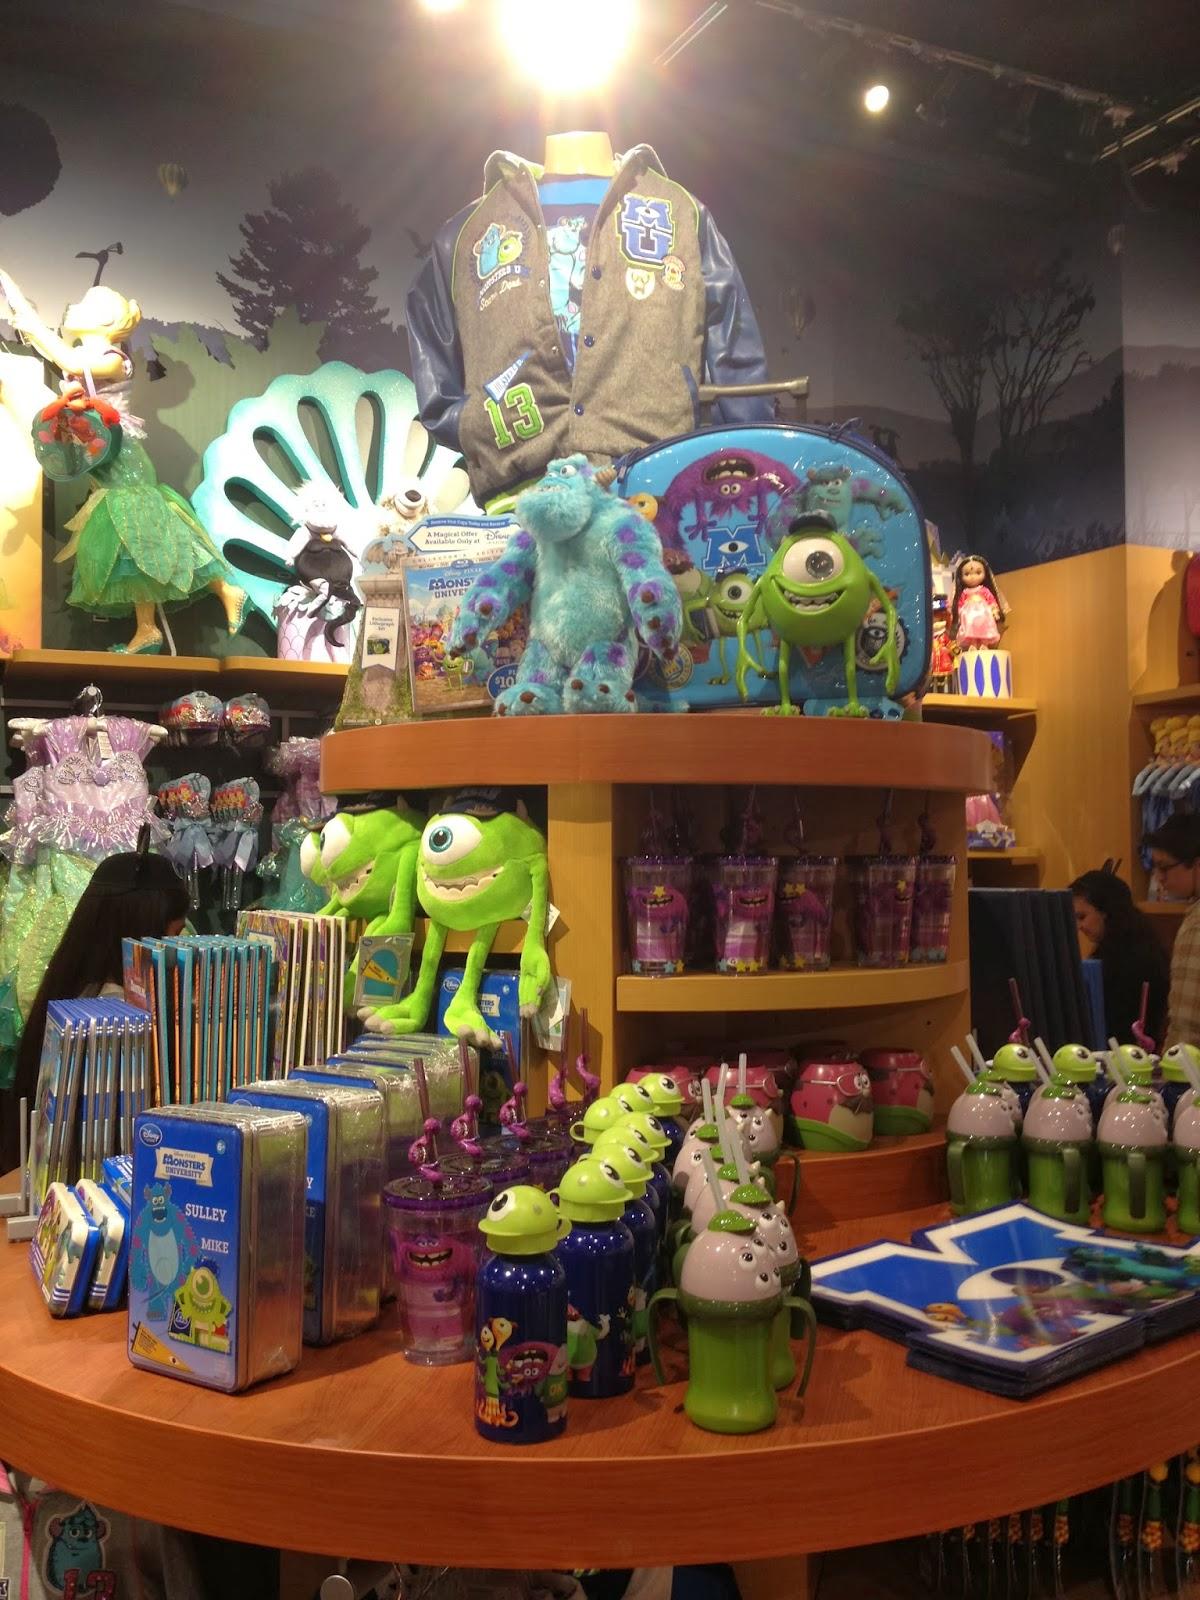 Imaginear Tony  Disney Store Opens In Temecula